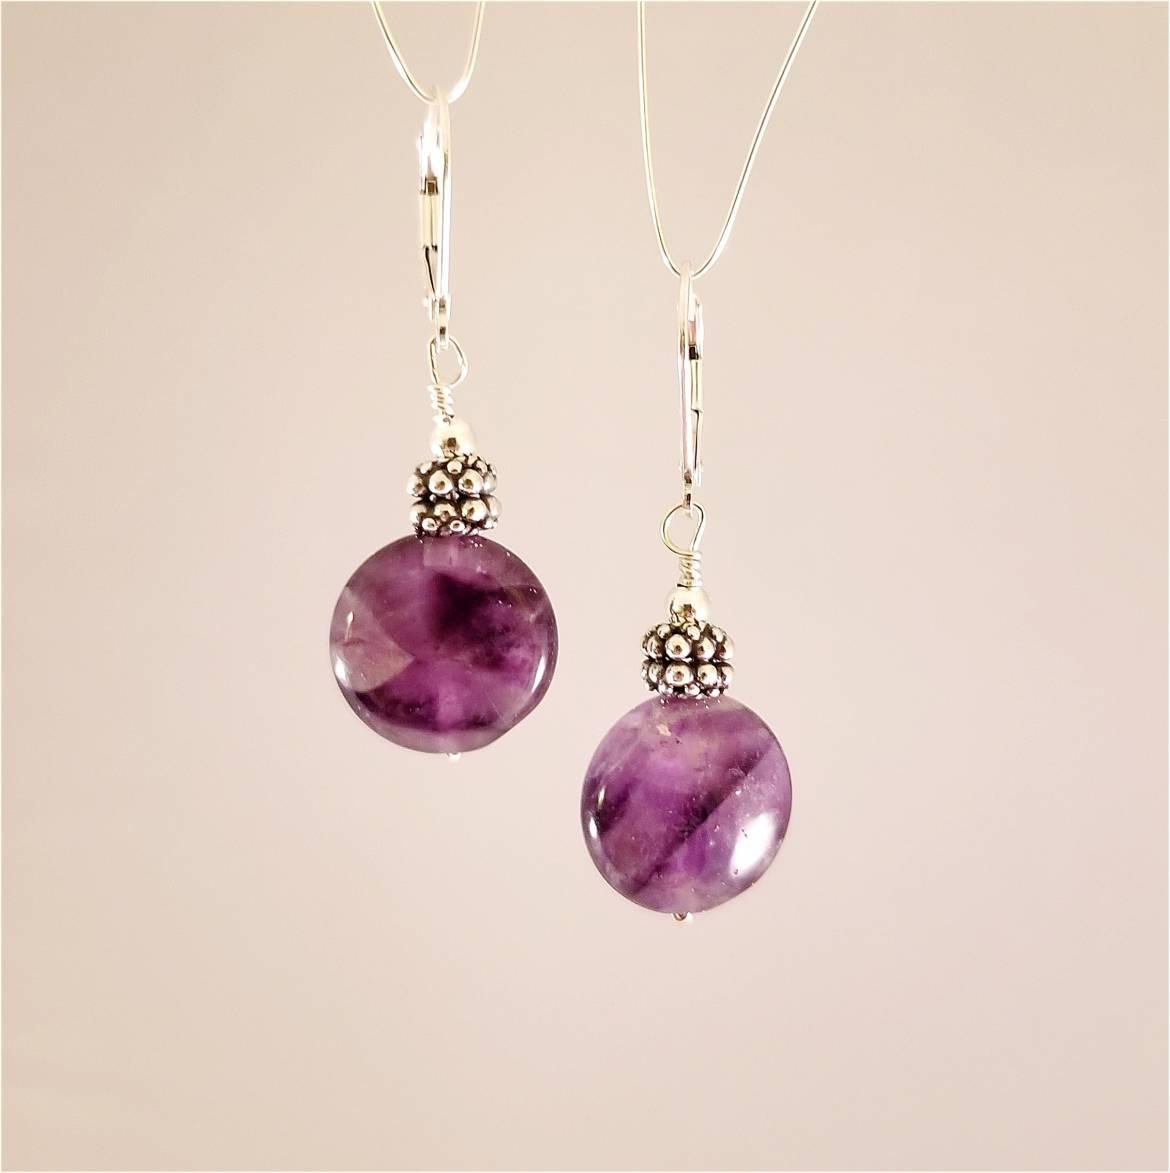 Amethyst-Coin-earrings-with-silver-1-1.jpg